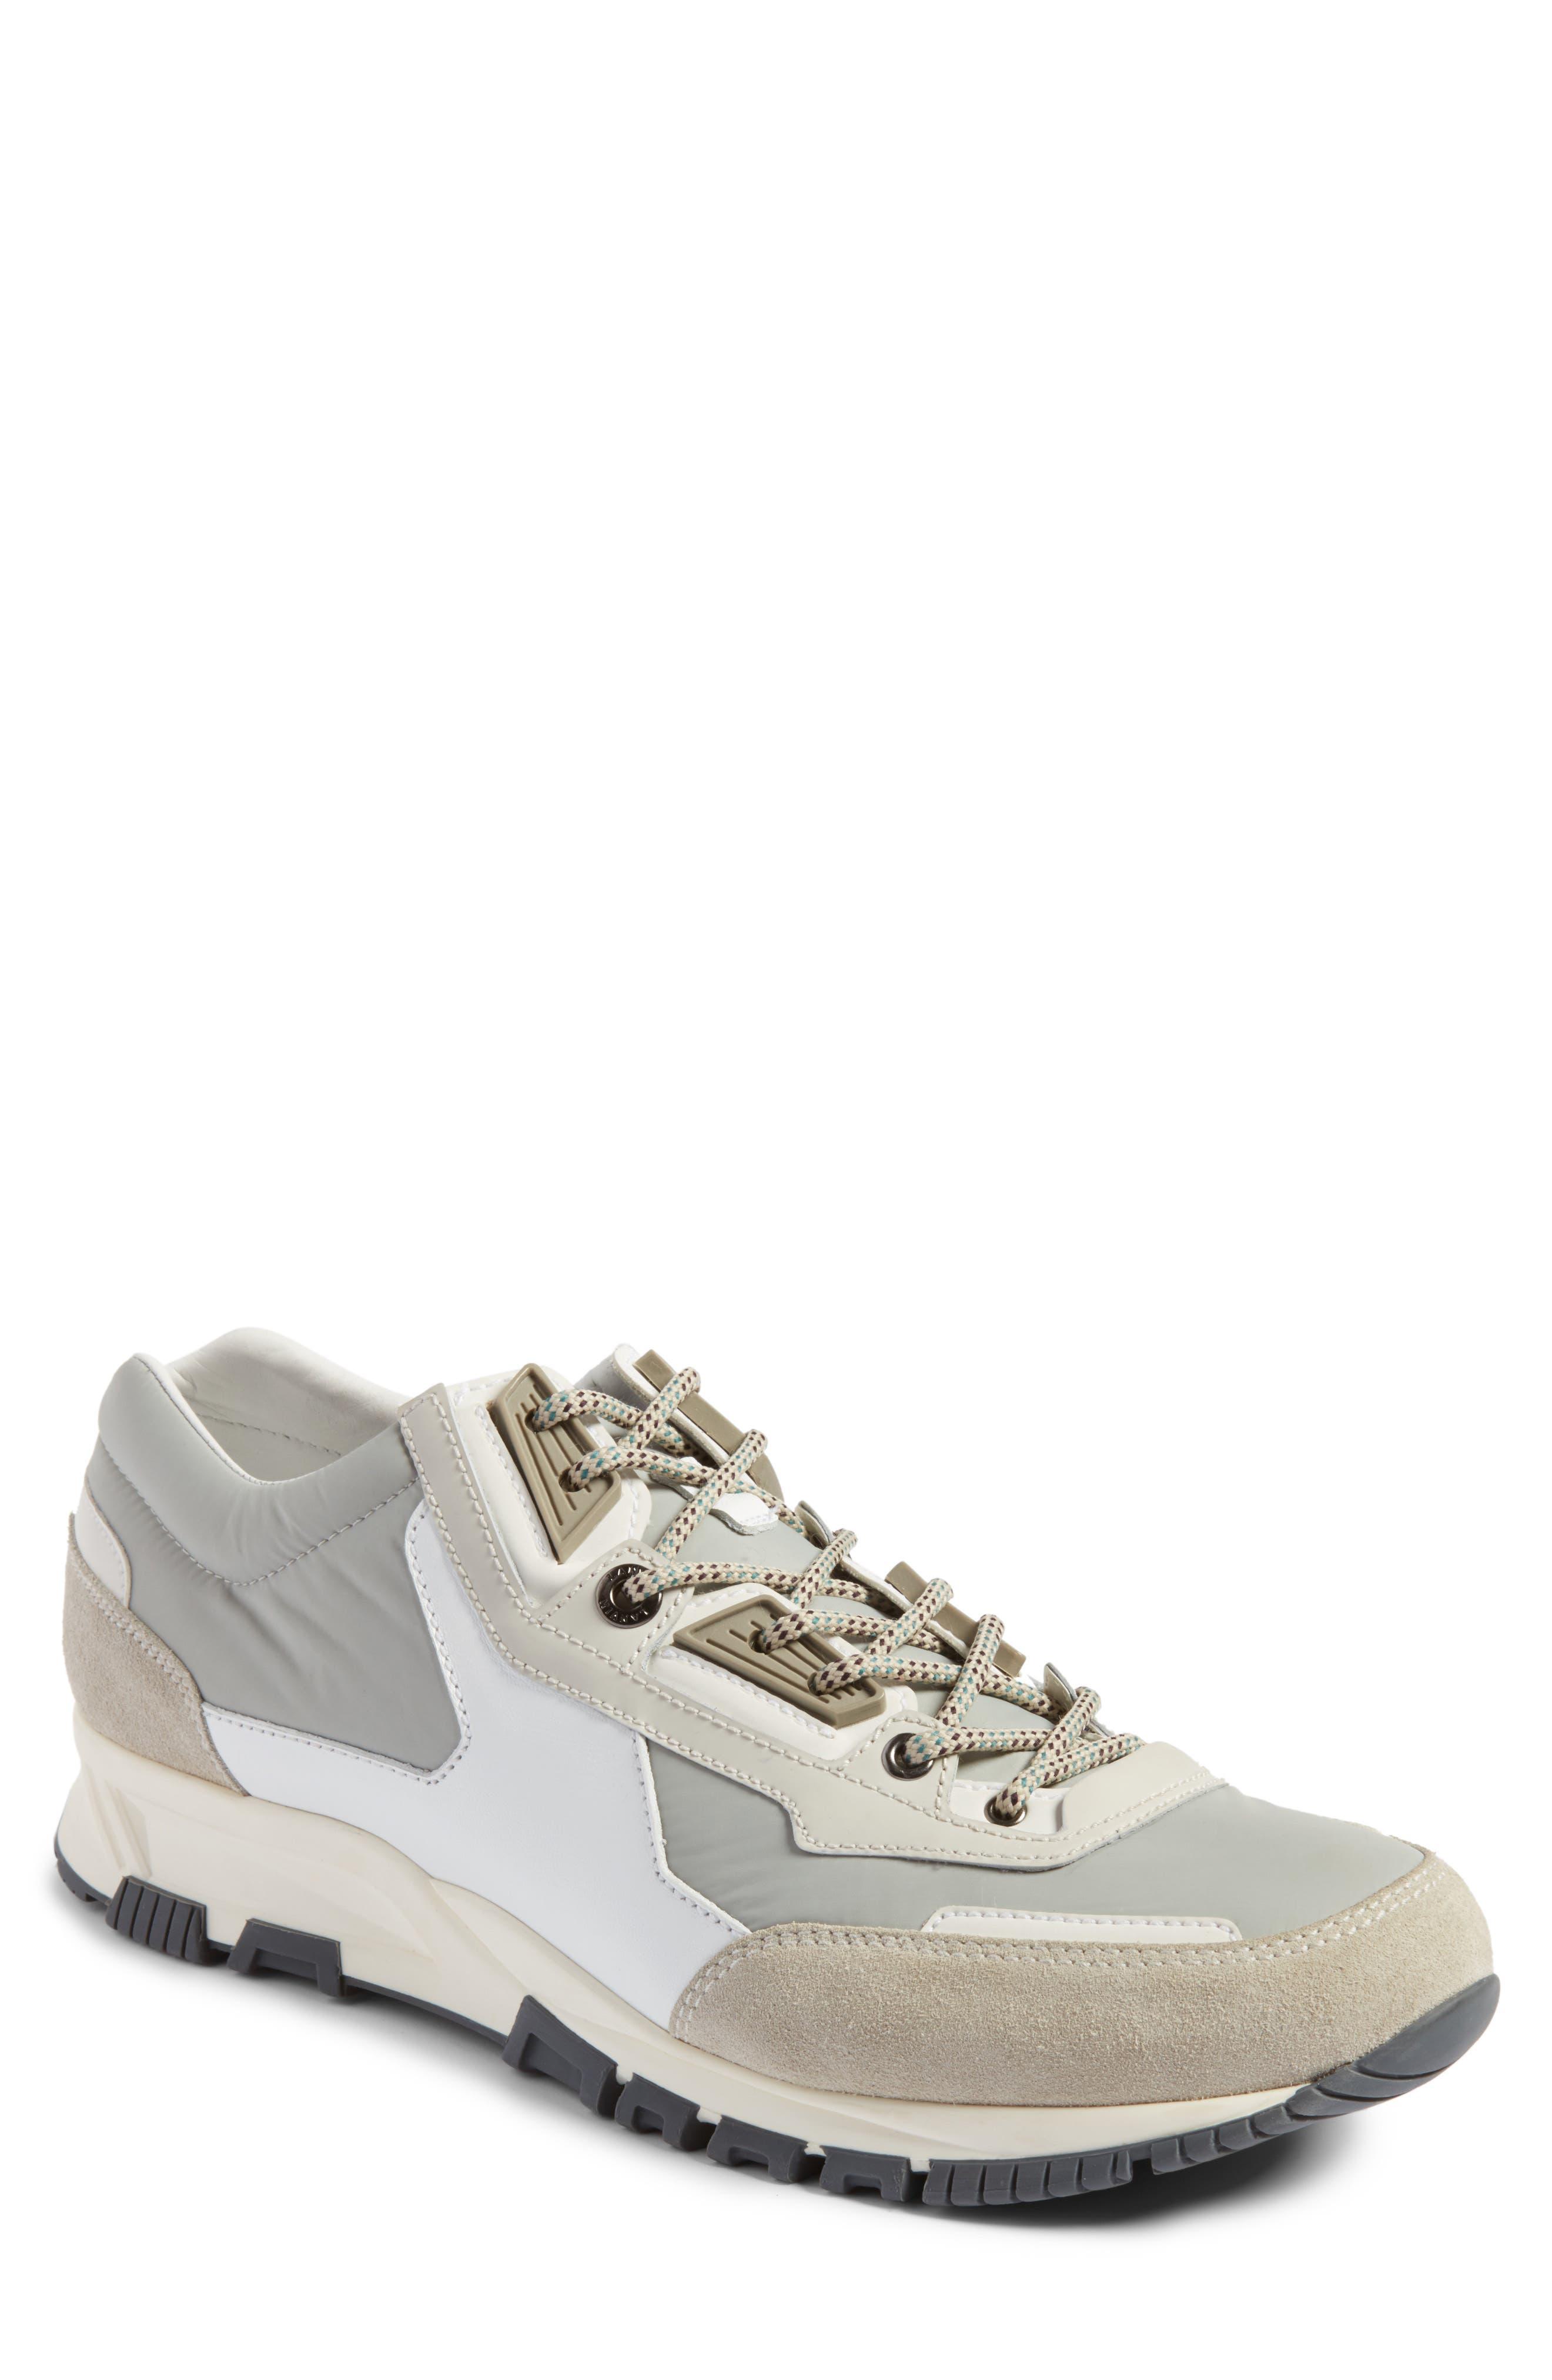 Running Sneaker,                         Main,                         color, 252